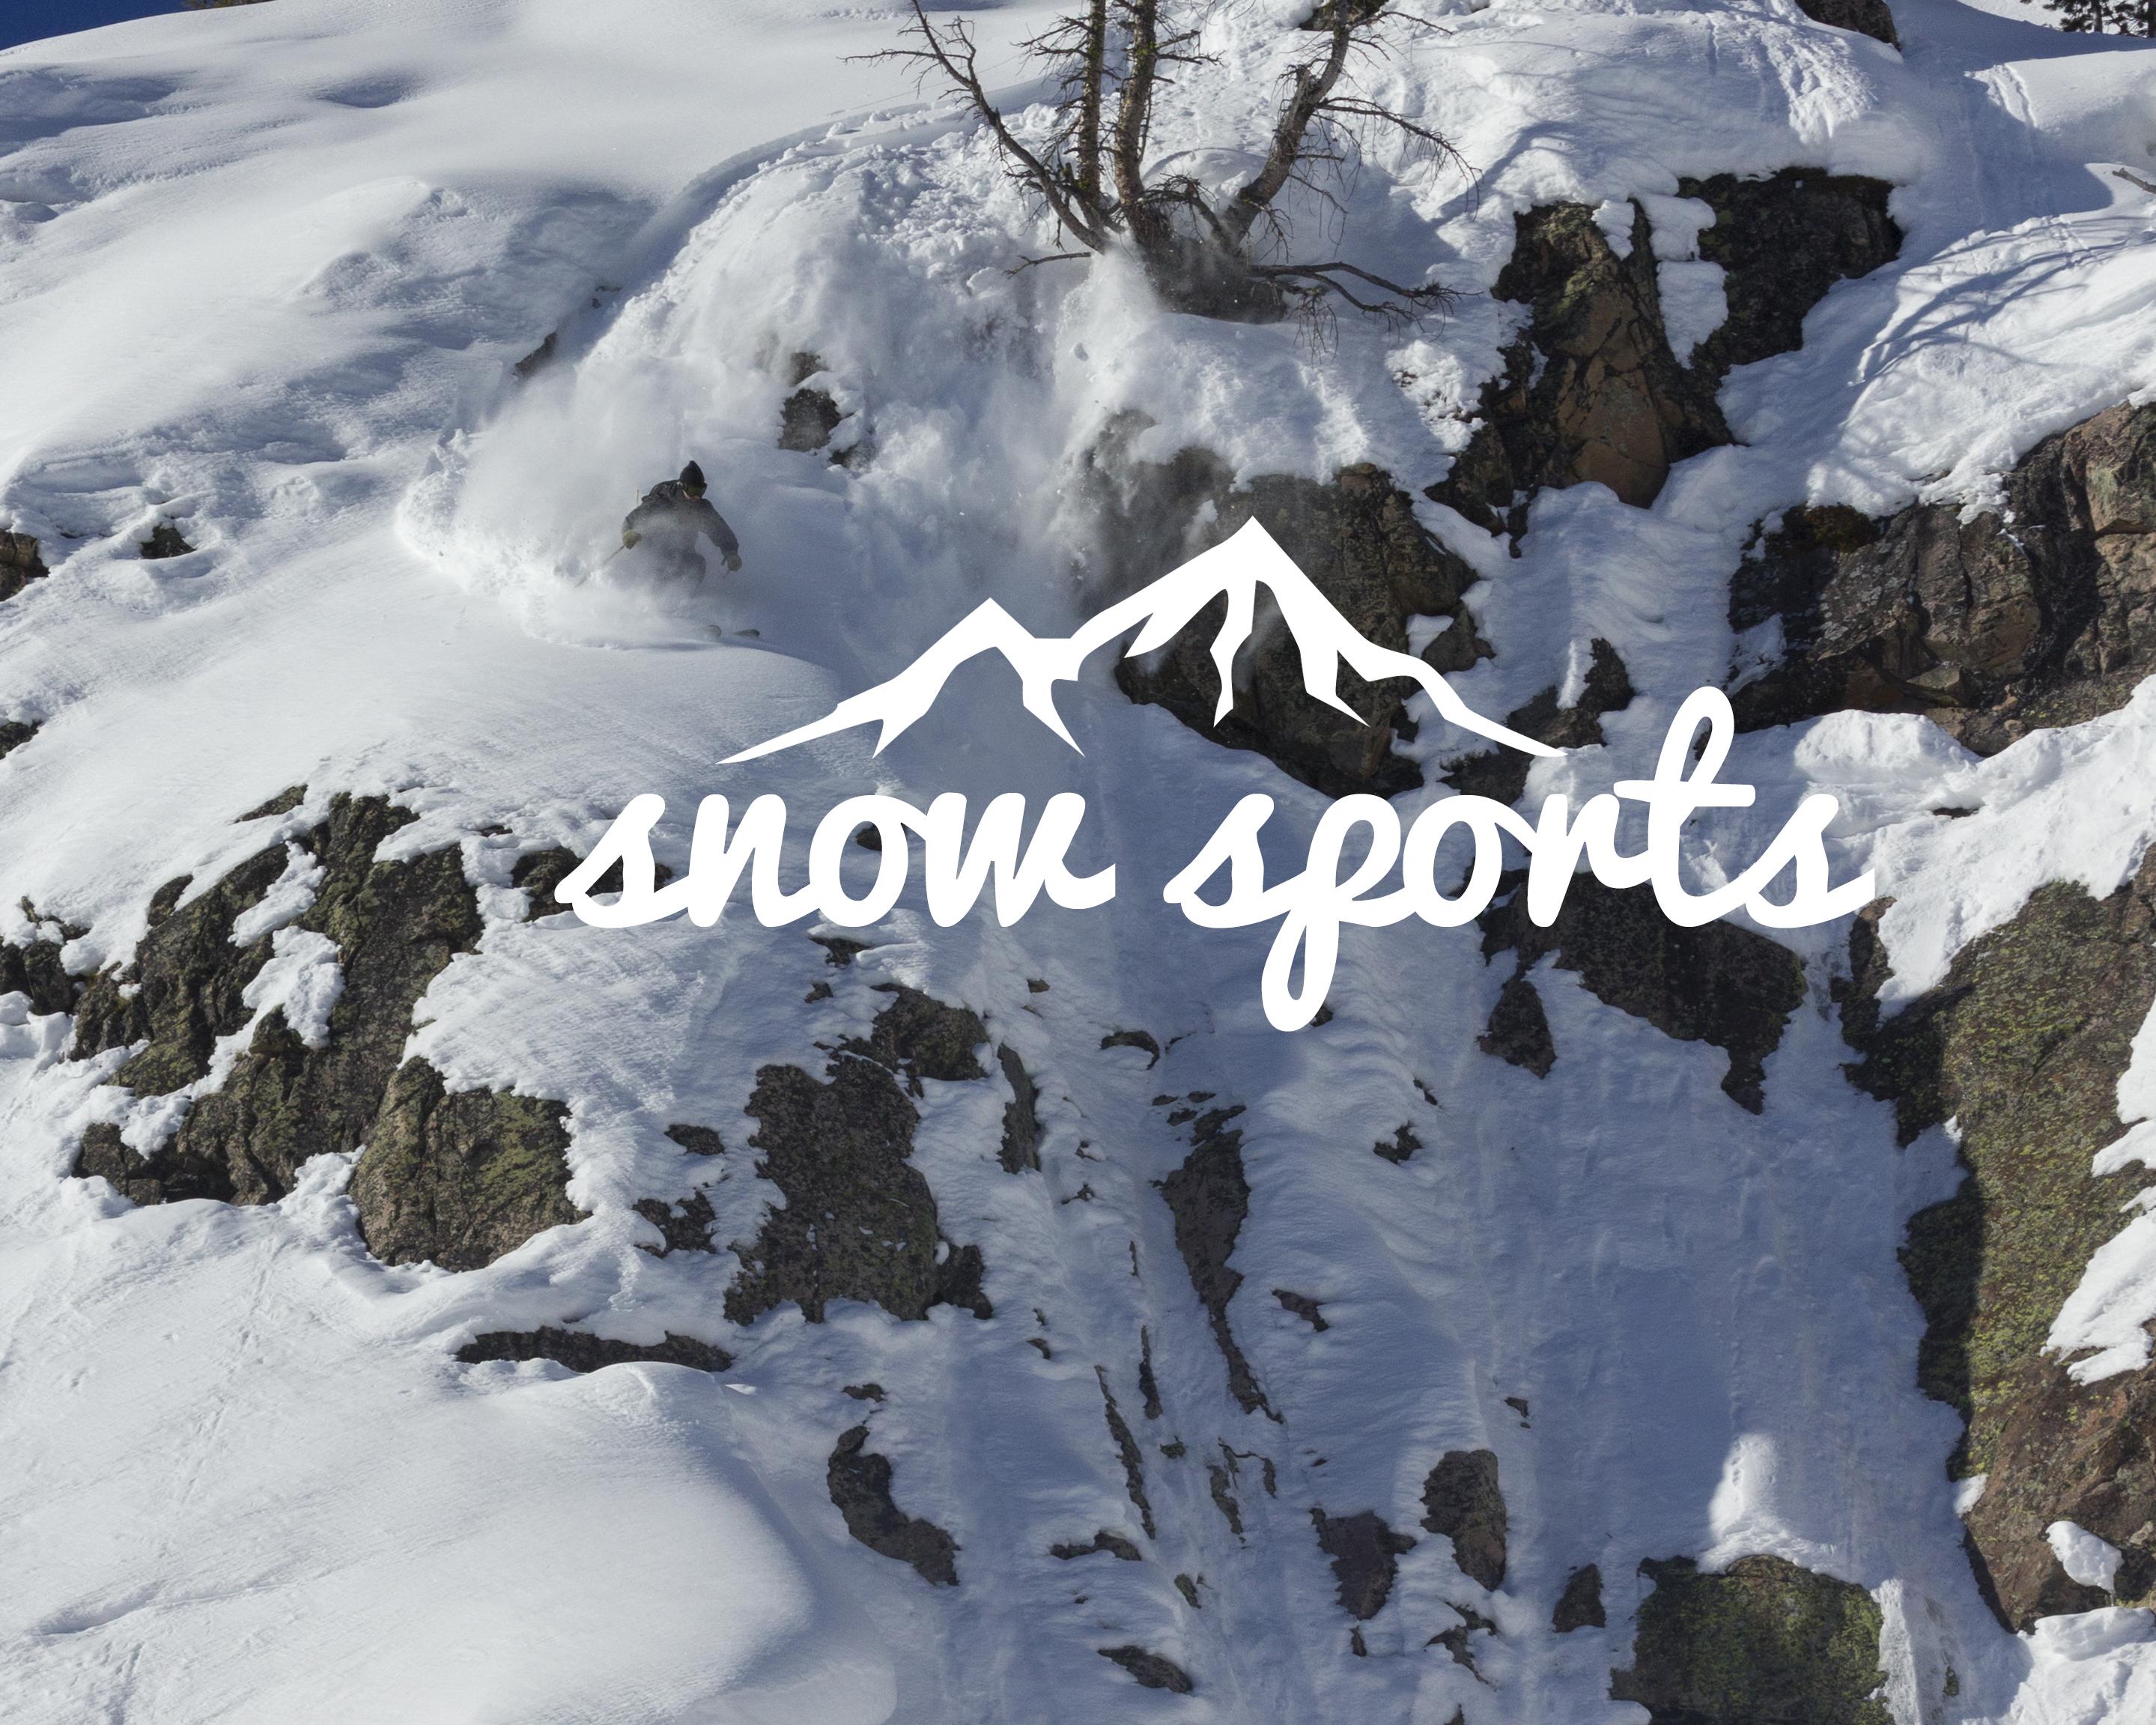 Snow Sports photos - Christopher Lisle 2016